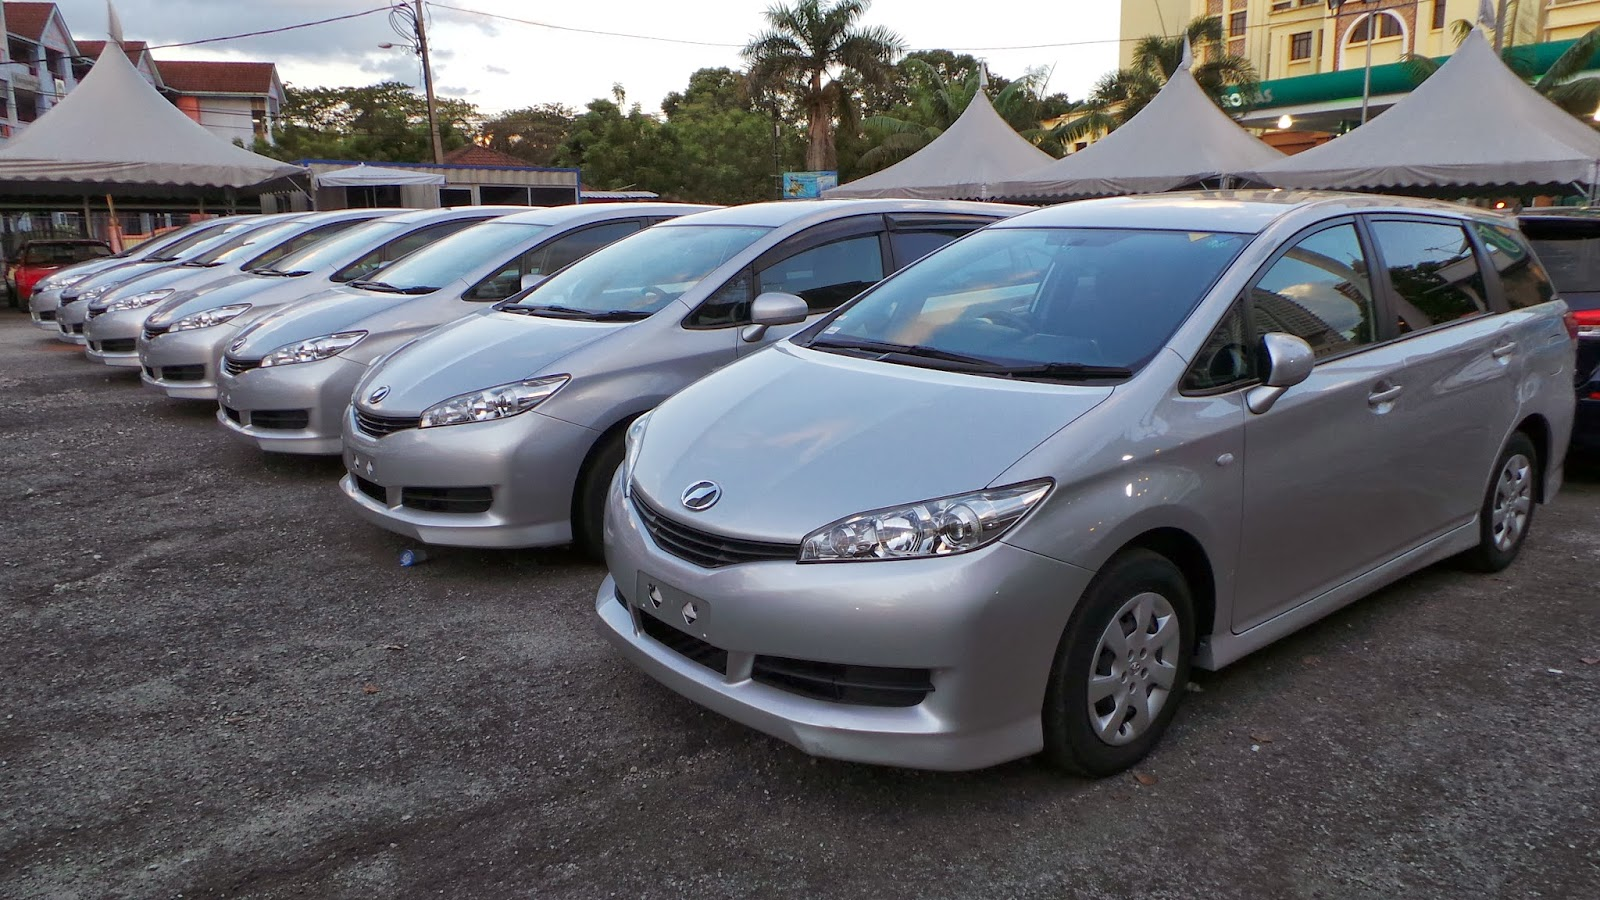 mudah com car for sale kl autos weblog mudah kereta sewa websites and